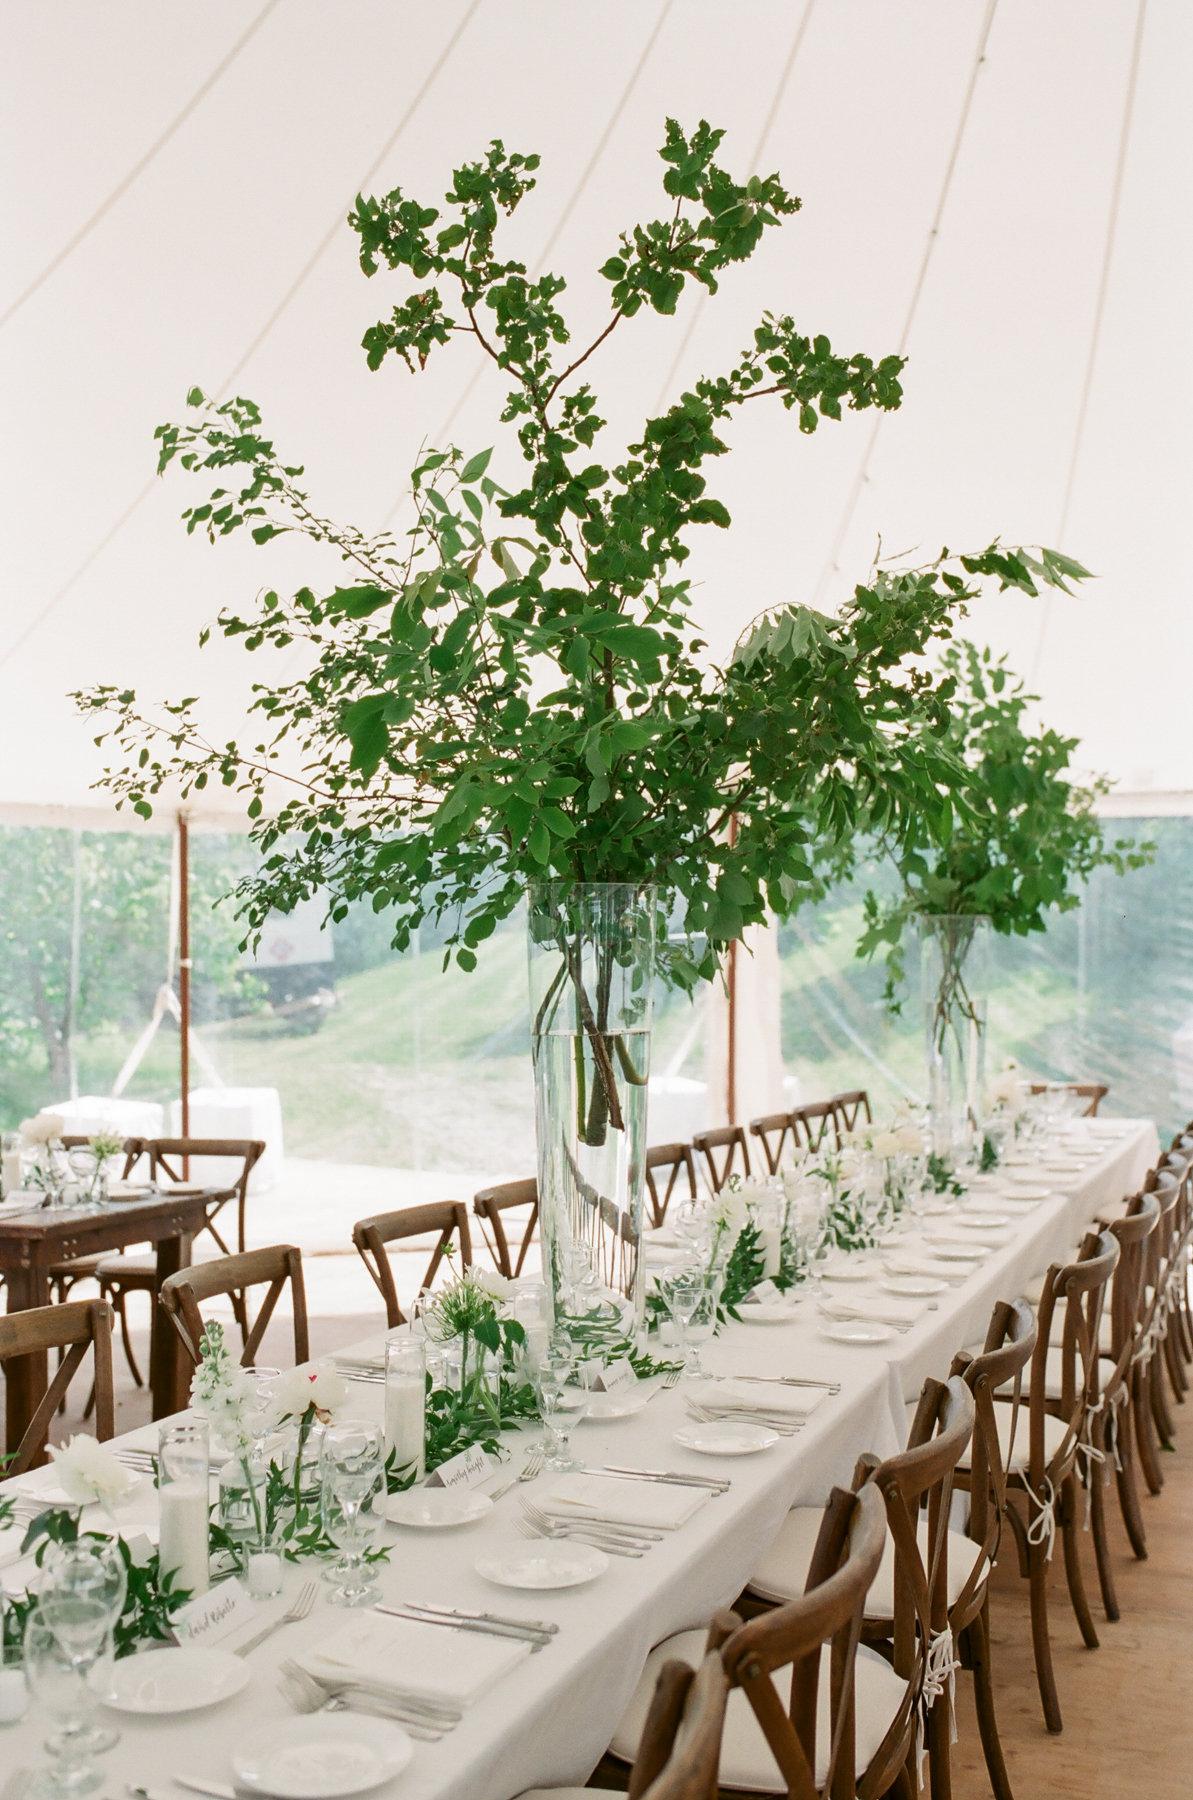 0815-maggiebrett-private-estate-wedding-000006330002.jpg